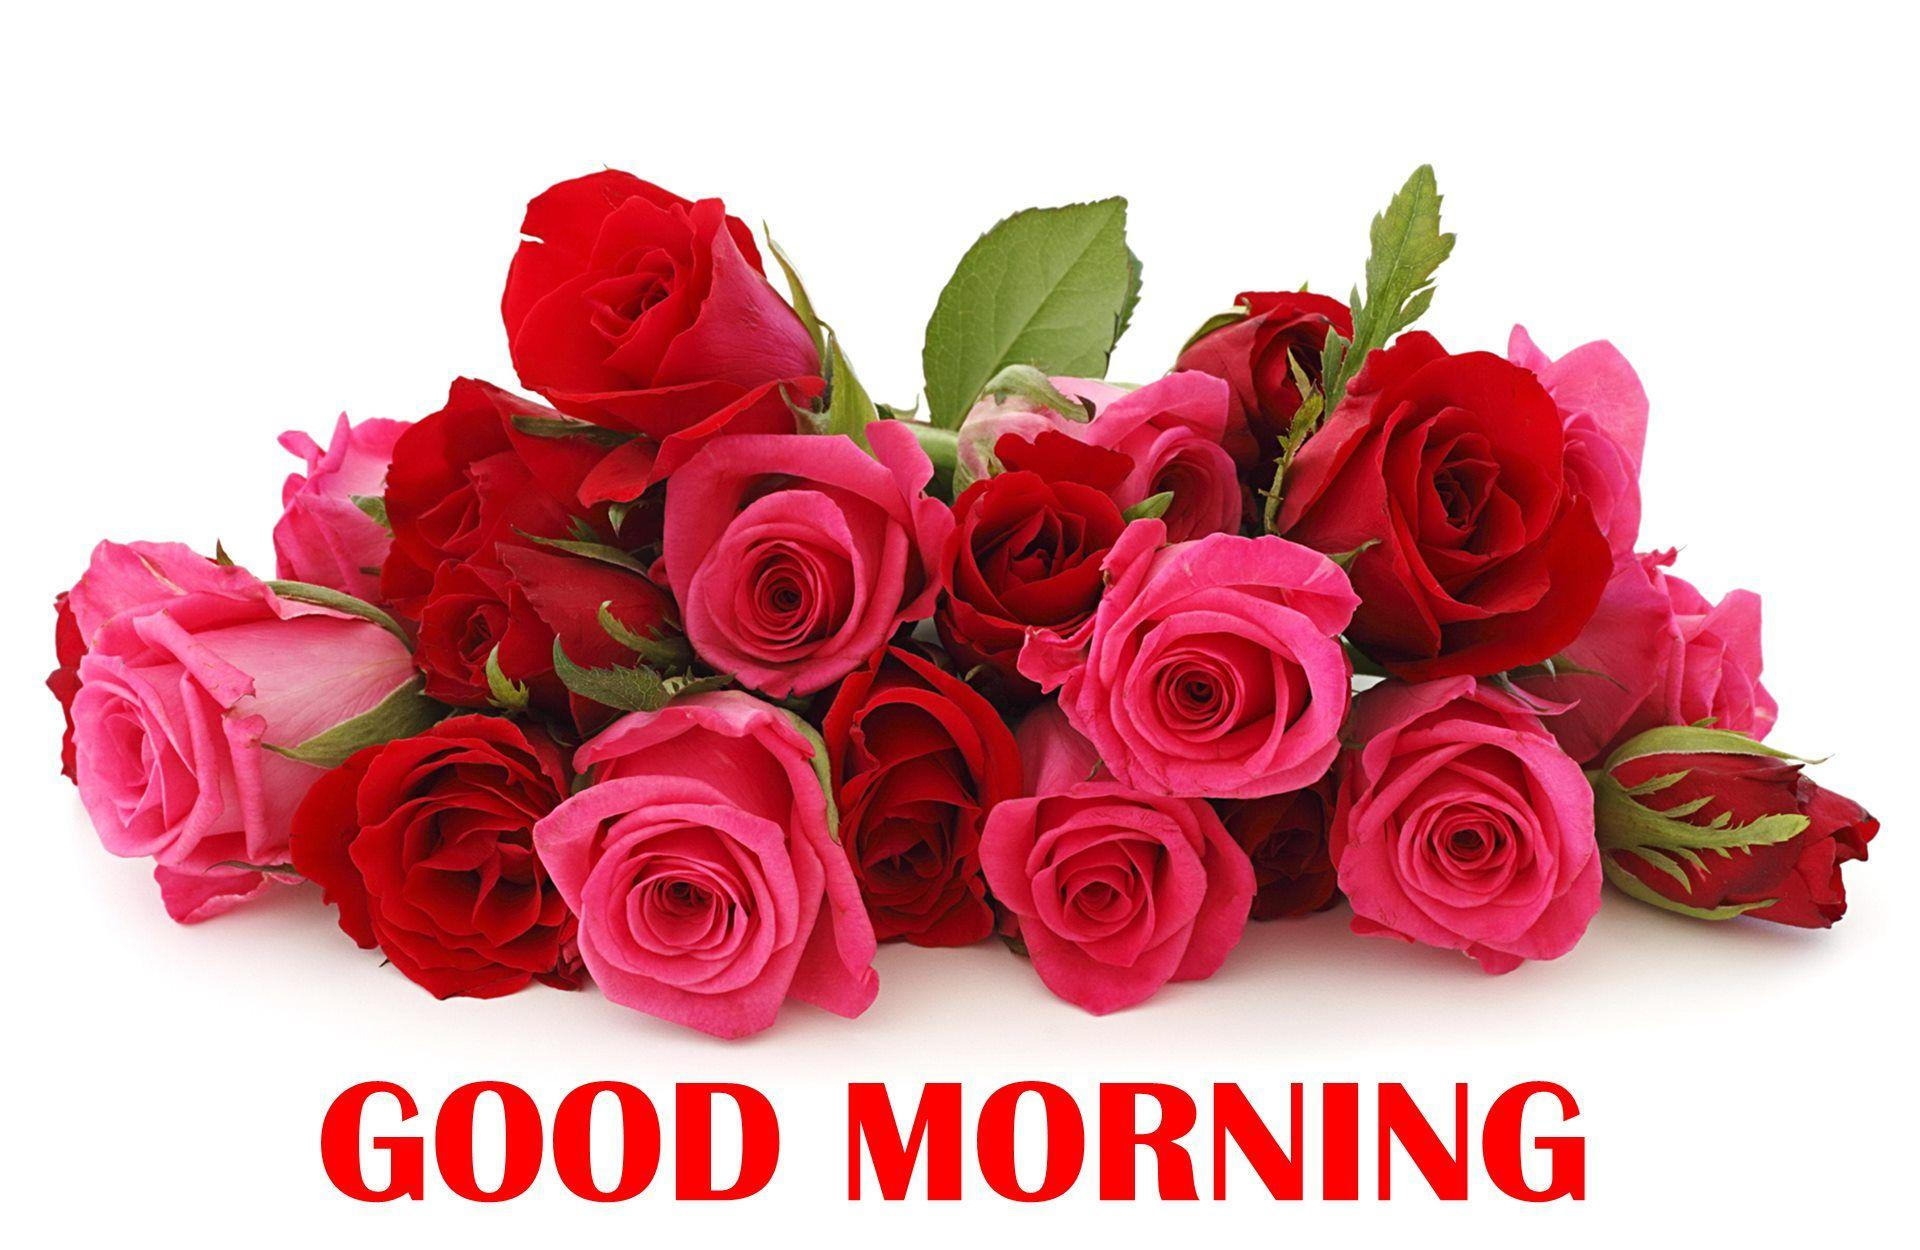 Good Morning Rose Wallpapers Wallpaper Cave